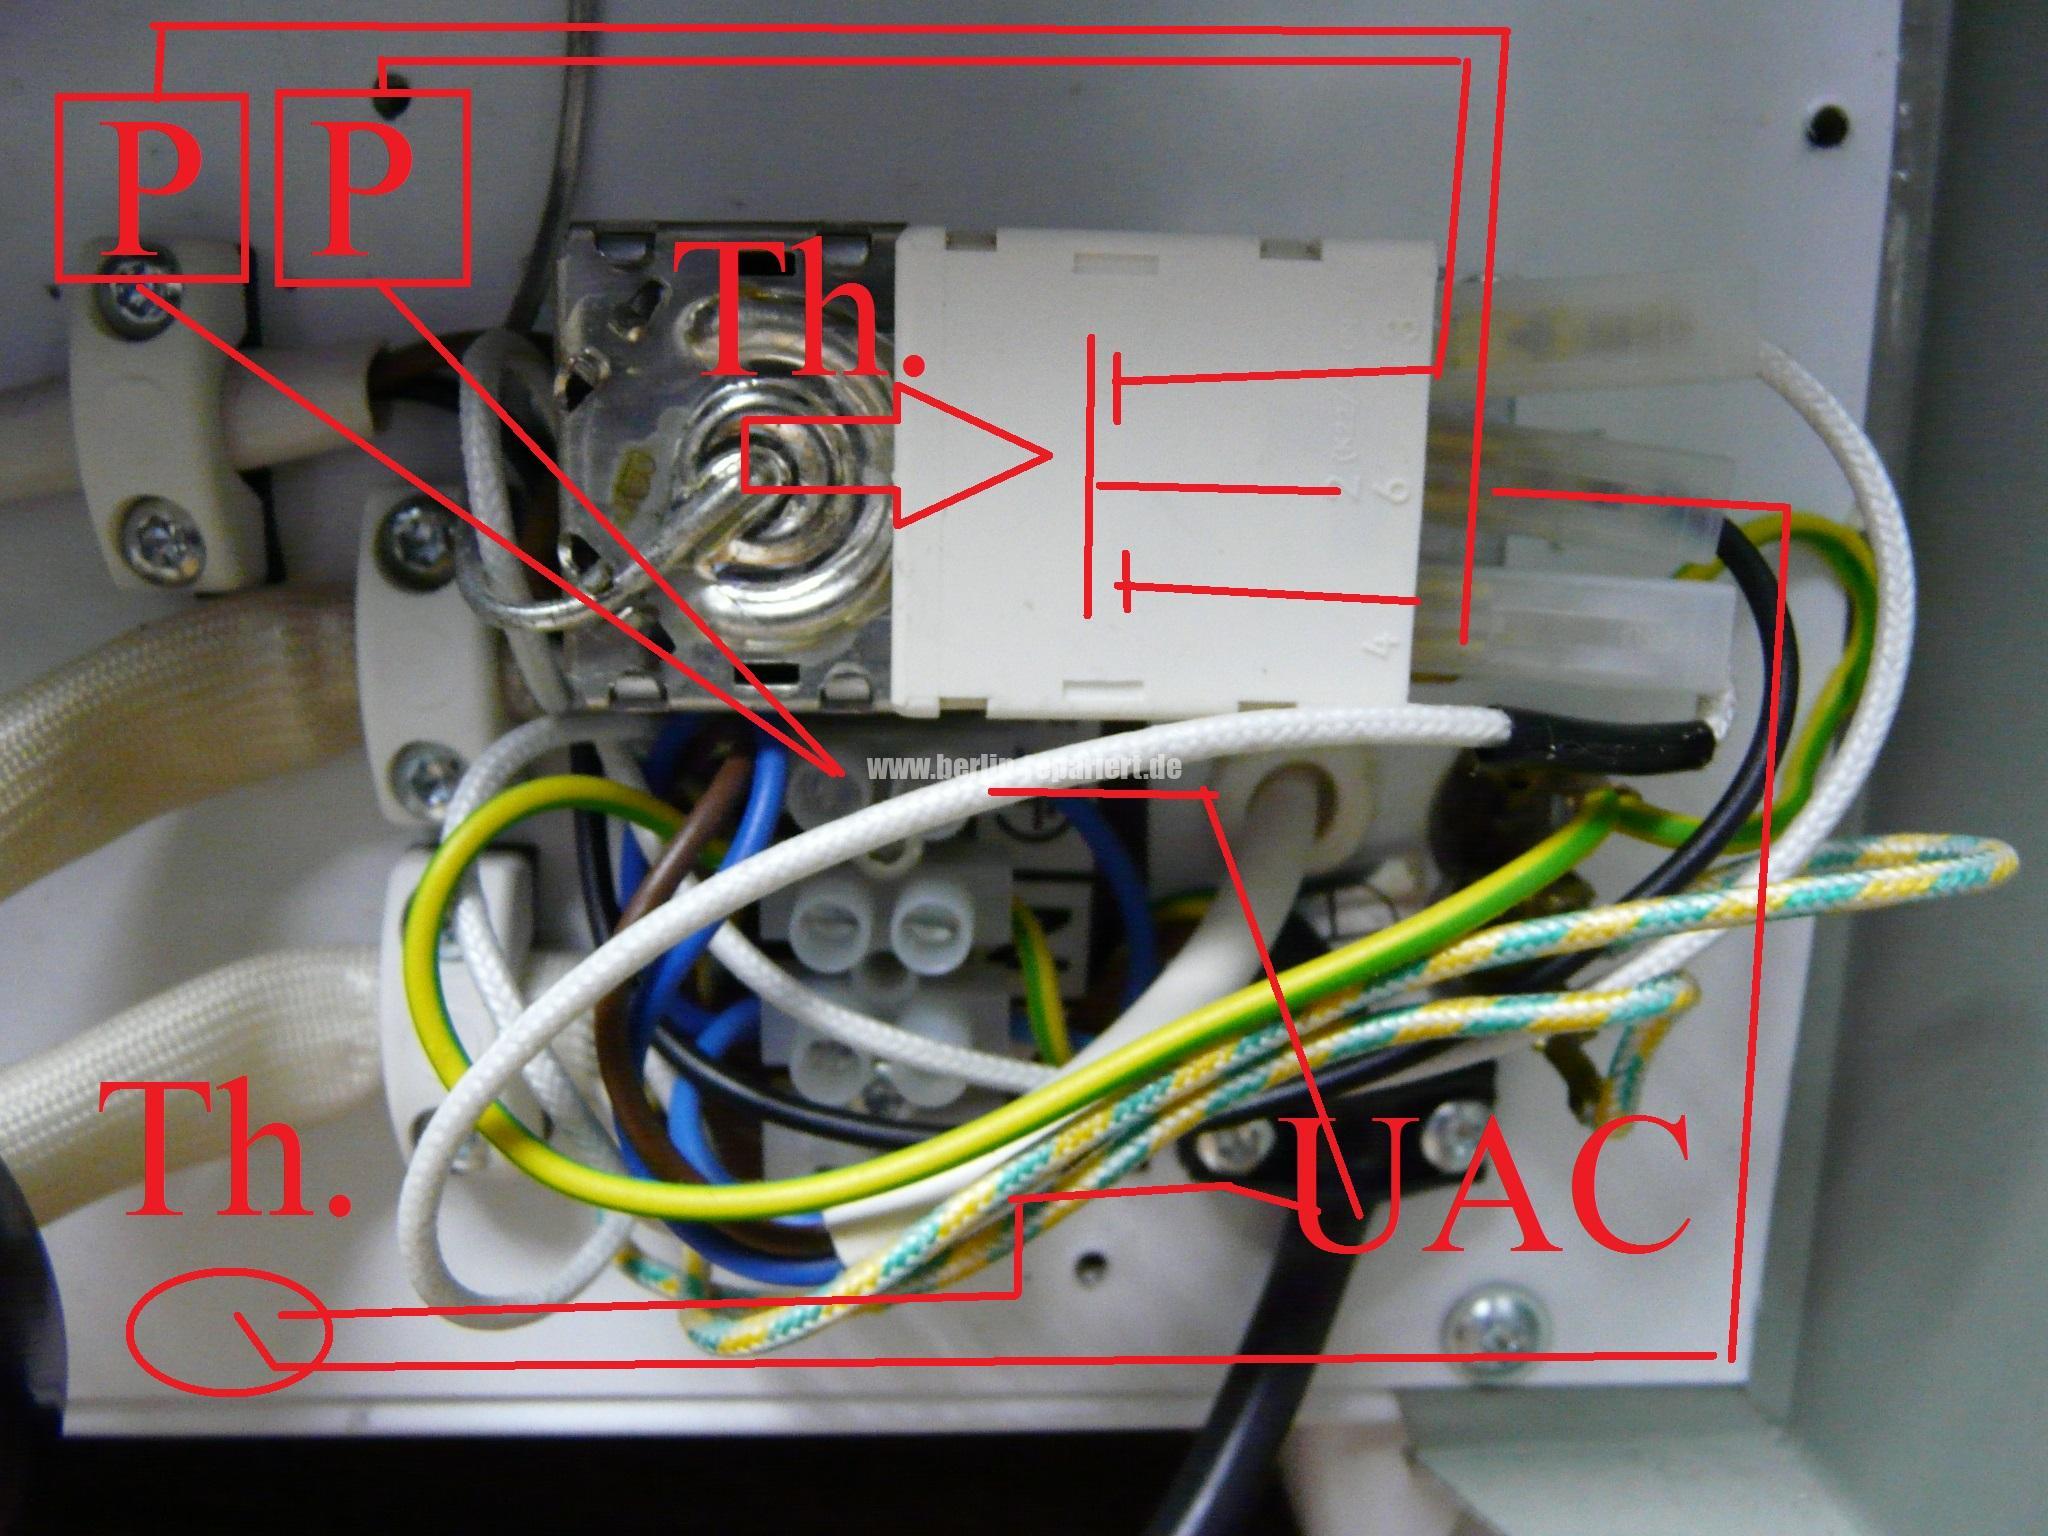 Smeg Kühlschrank Thermostat Tauschen : Smeg kühlschrank birne wechseln gorenje kühlschrank birne